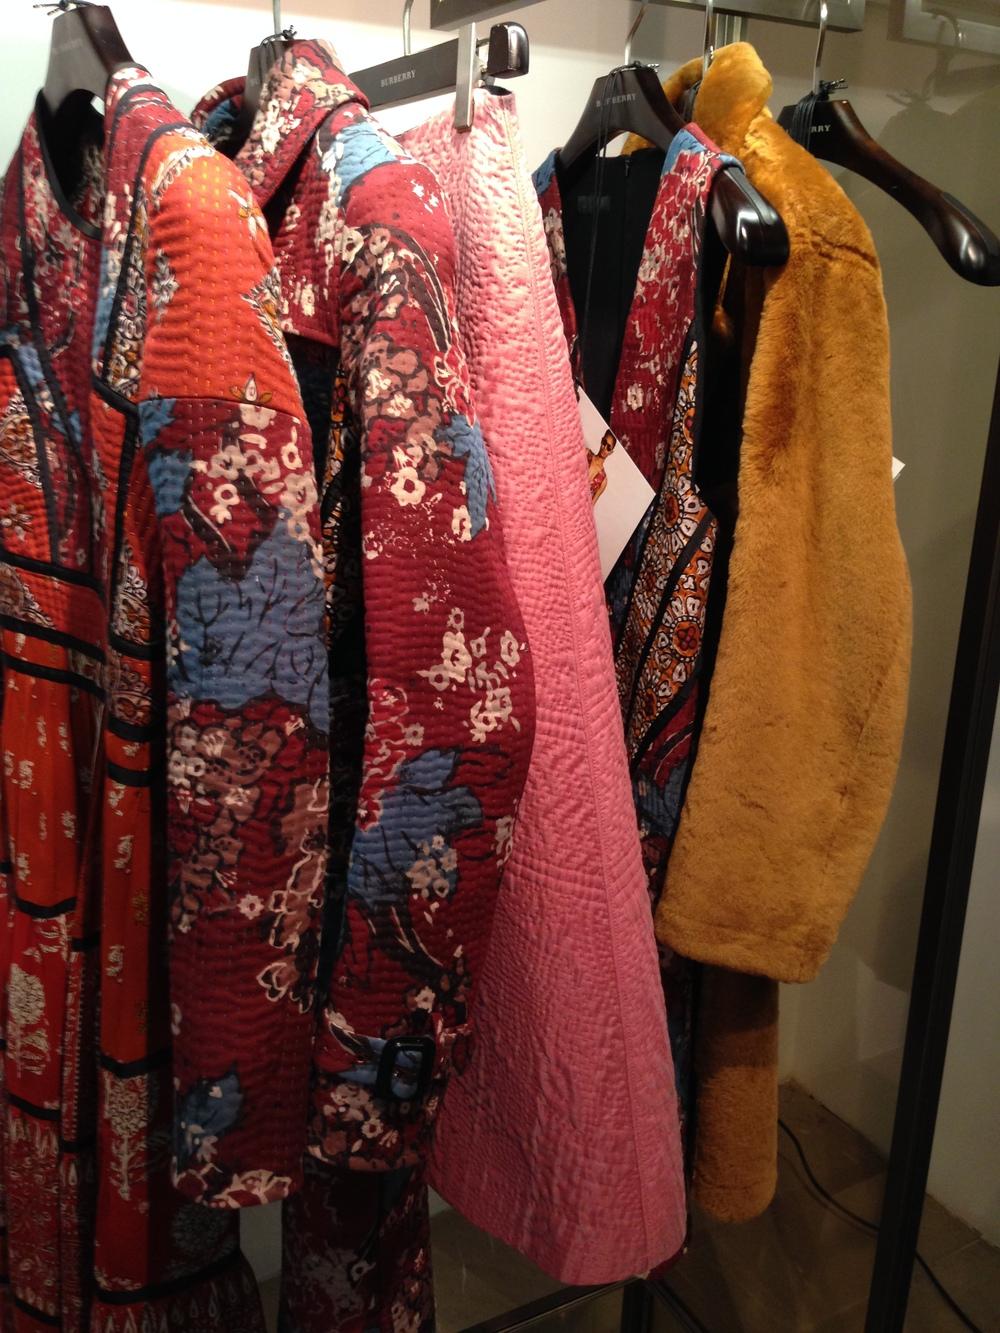 Burberry Prorsum Autumn Winter Womenswear 2015